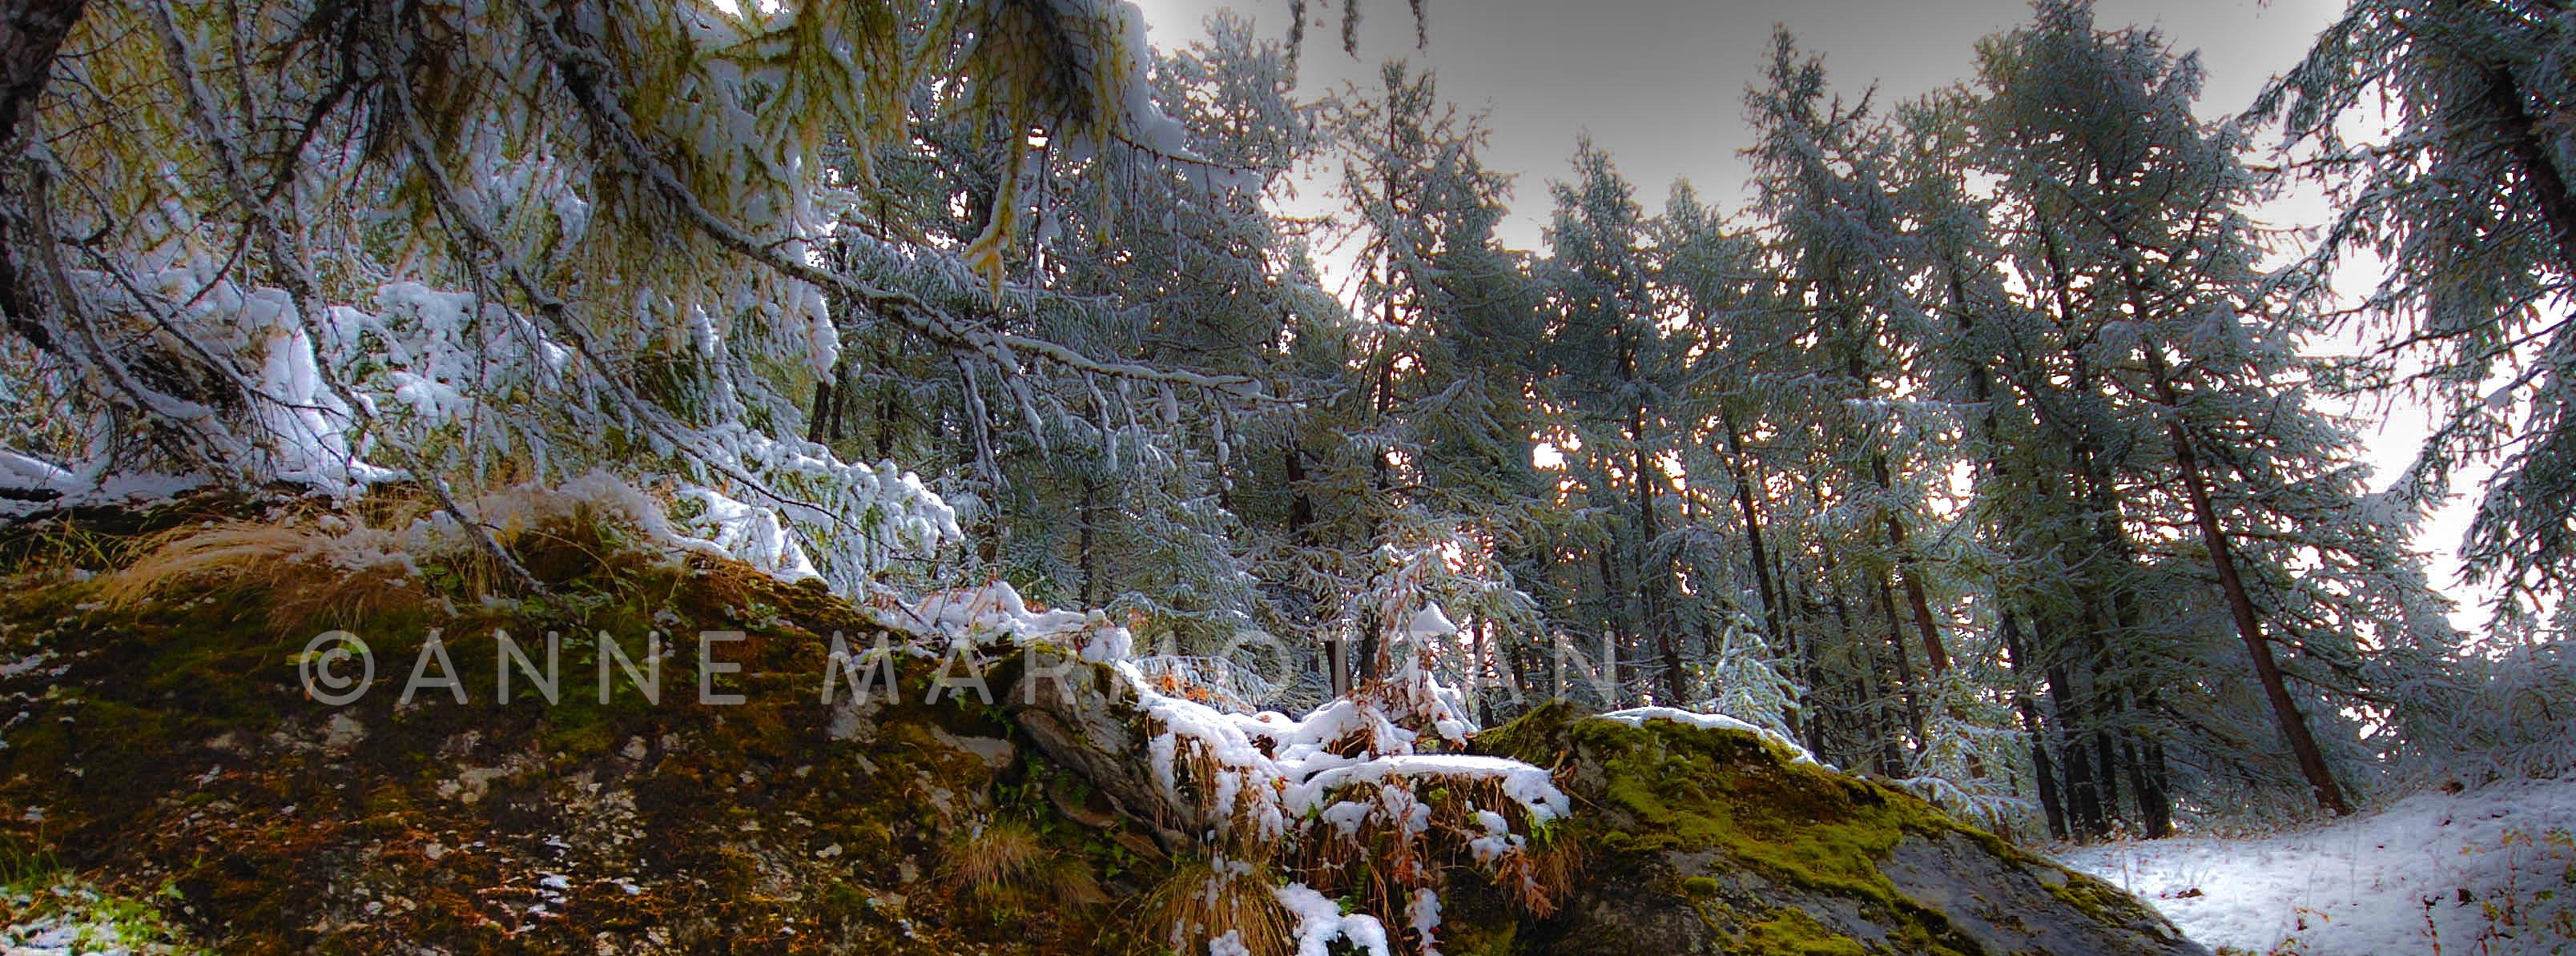 monal_forêt_©Anne_Marmottan